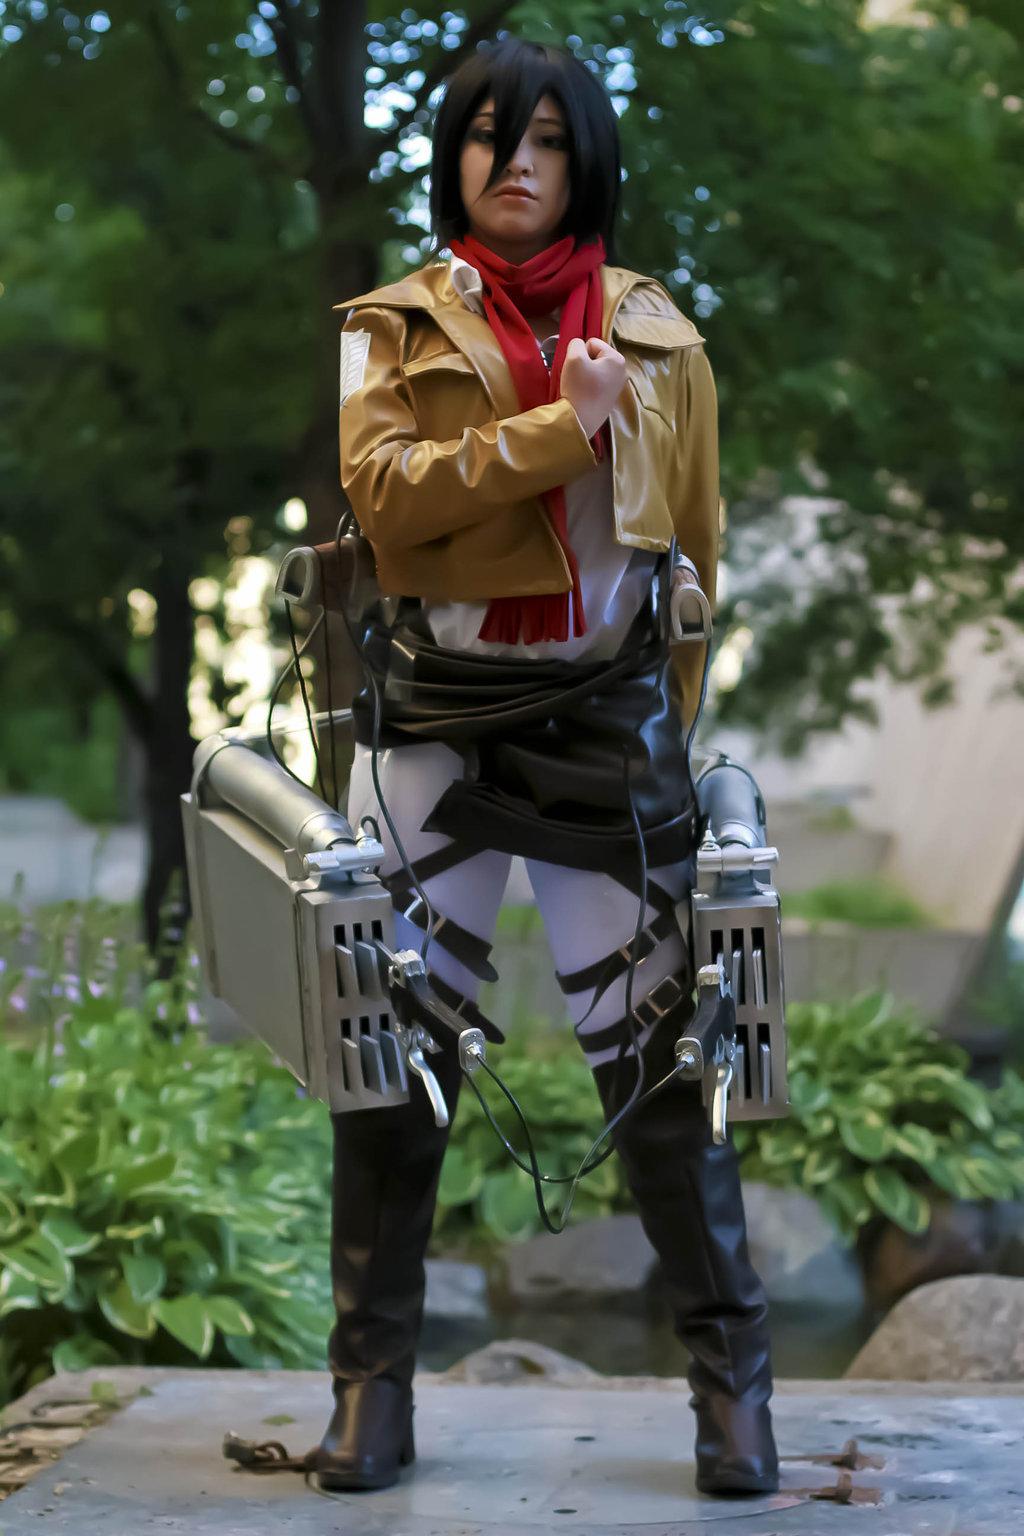 Attack on Titan cosplay wig | Attack On Titan